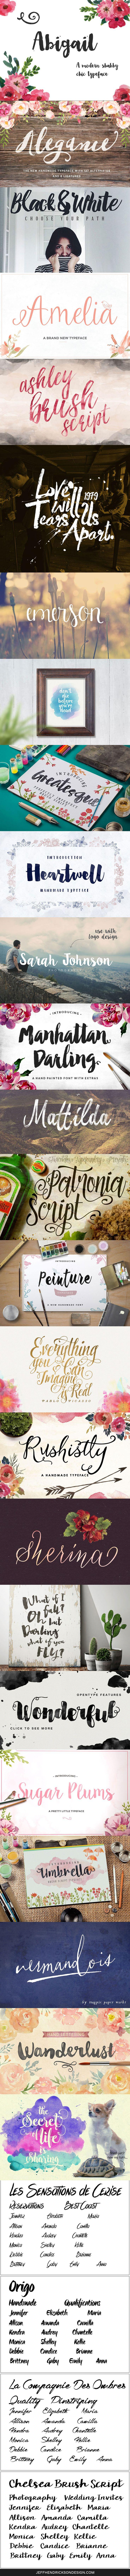 31 brush script fonts for identity, branding, logos, etc. Some are free.